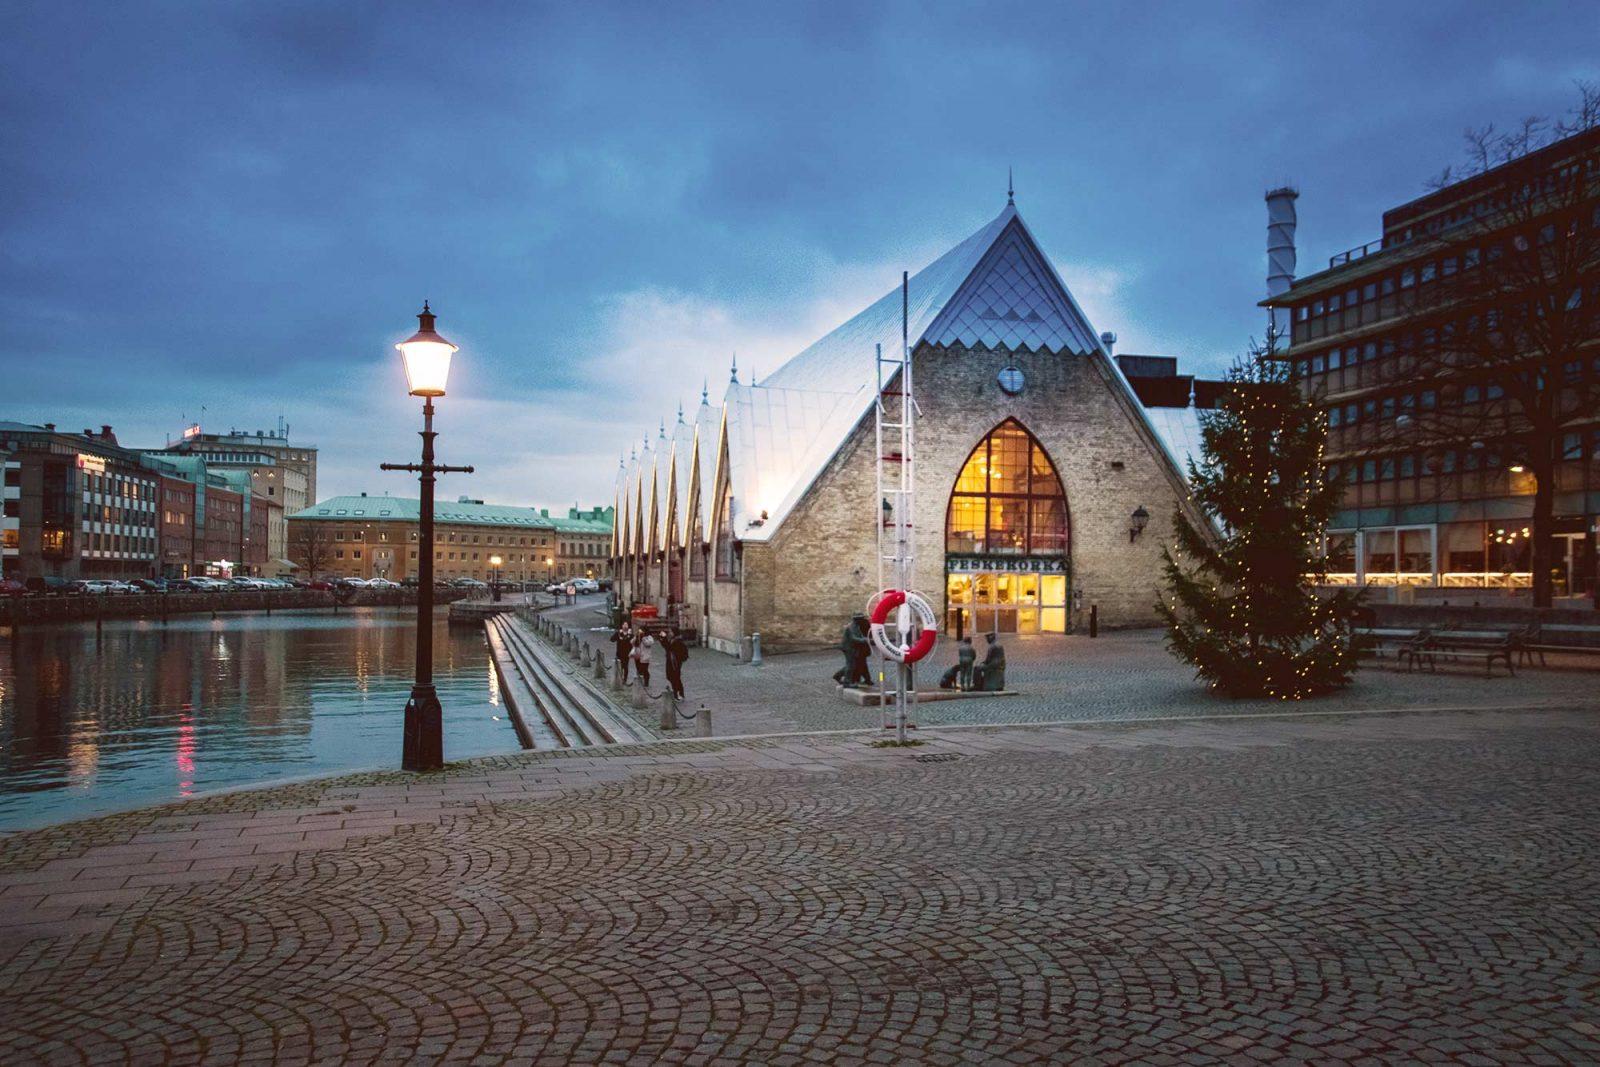 faq sweden  fish church.n8lewthksnbw - Швеция: что нужно знать перед поездкой